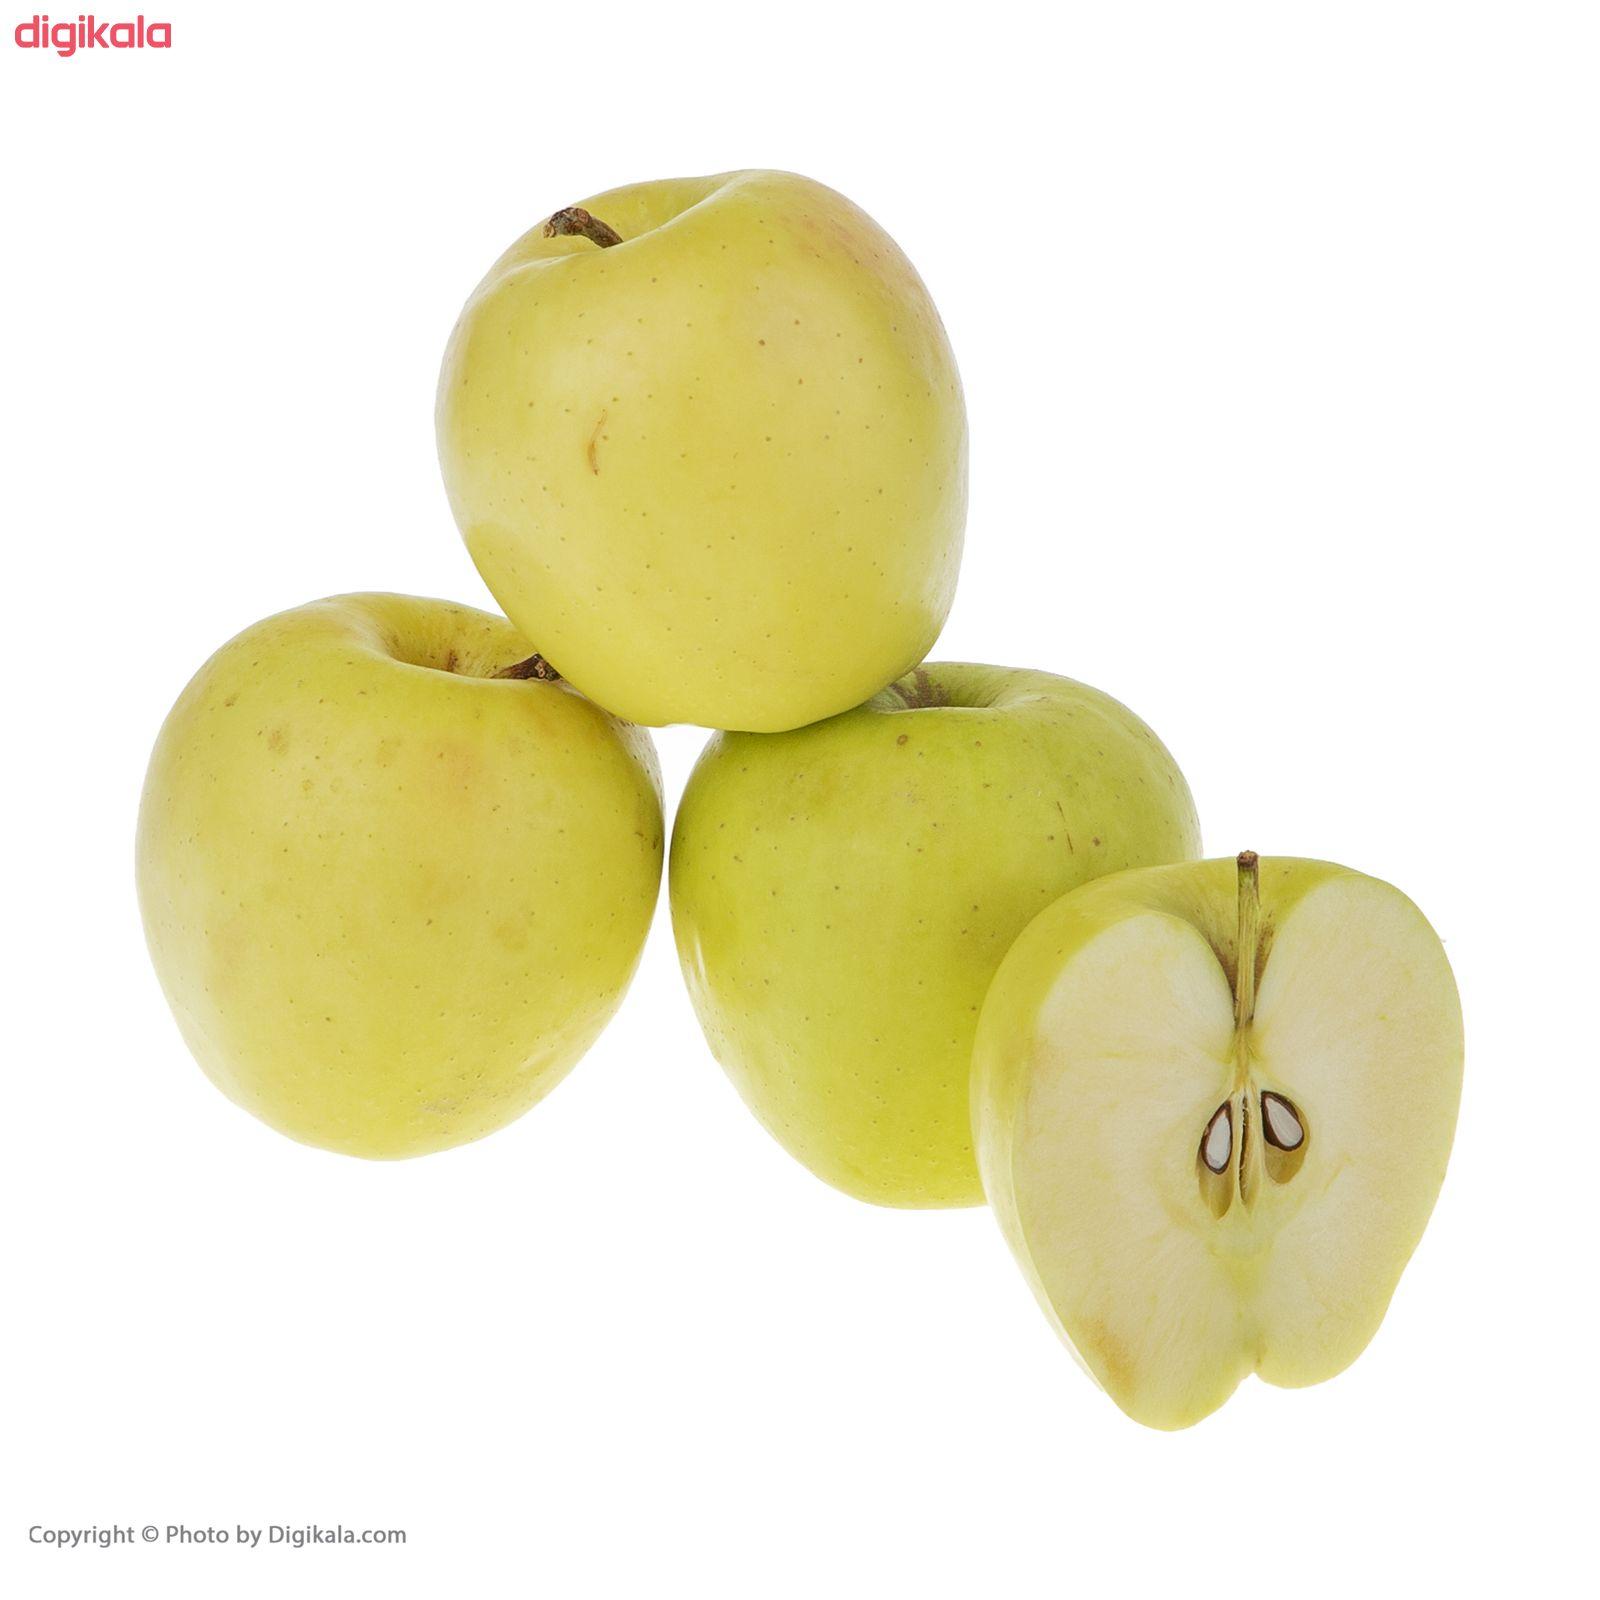 سیب زرد دماوند فله - 1 کیلوگرم main 1 3